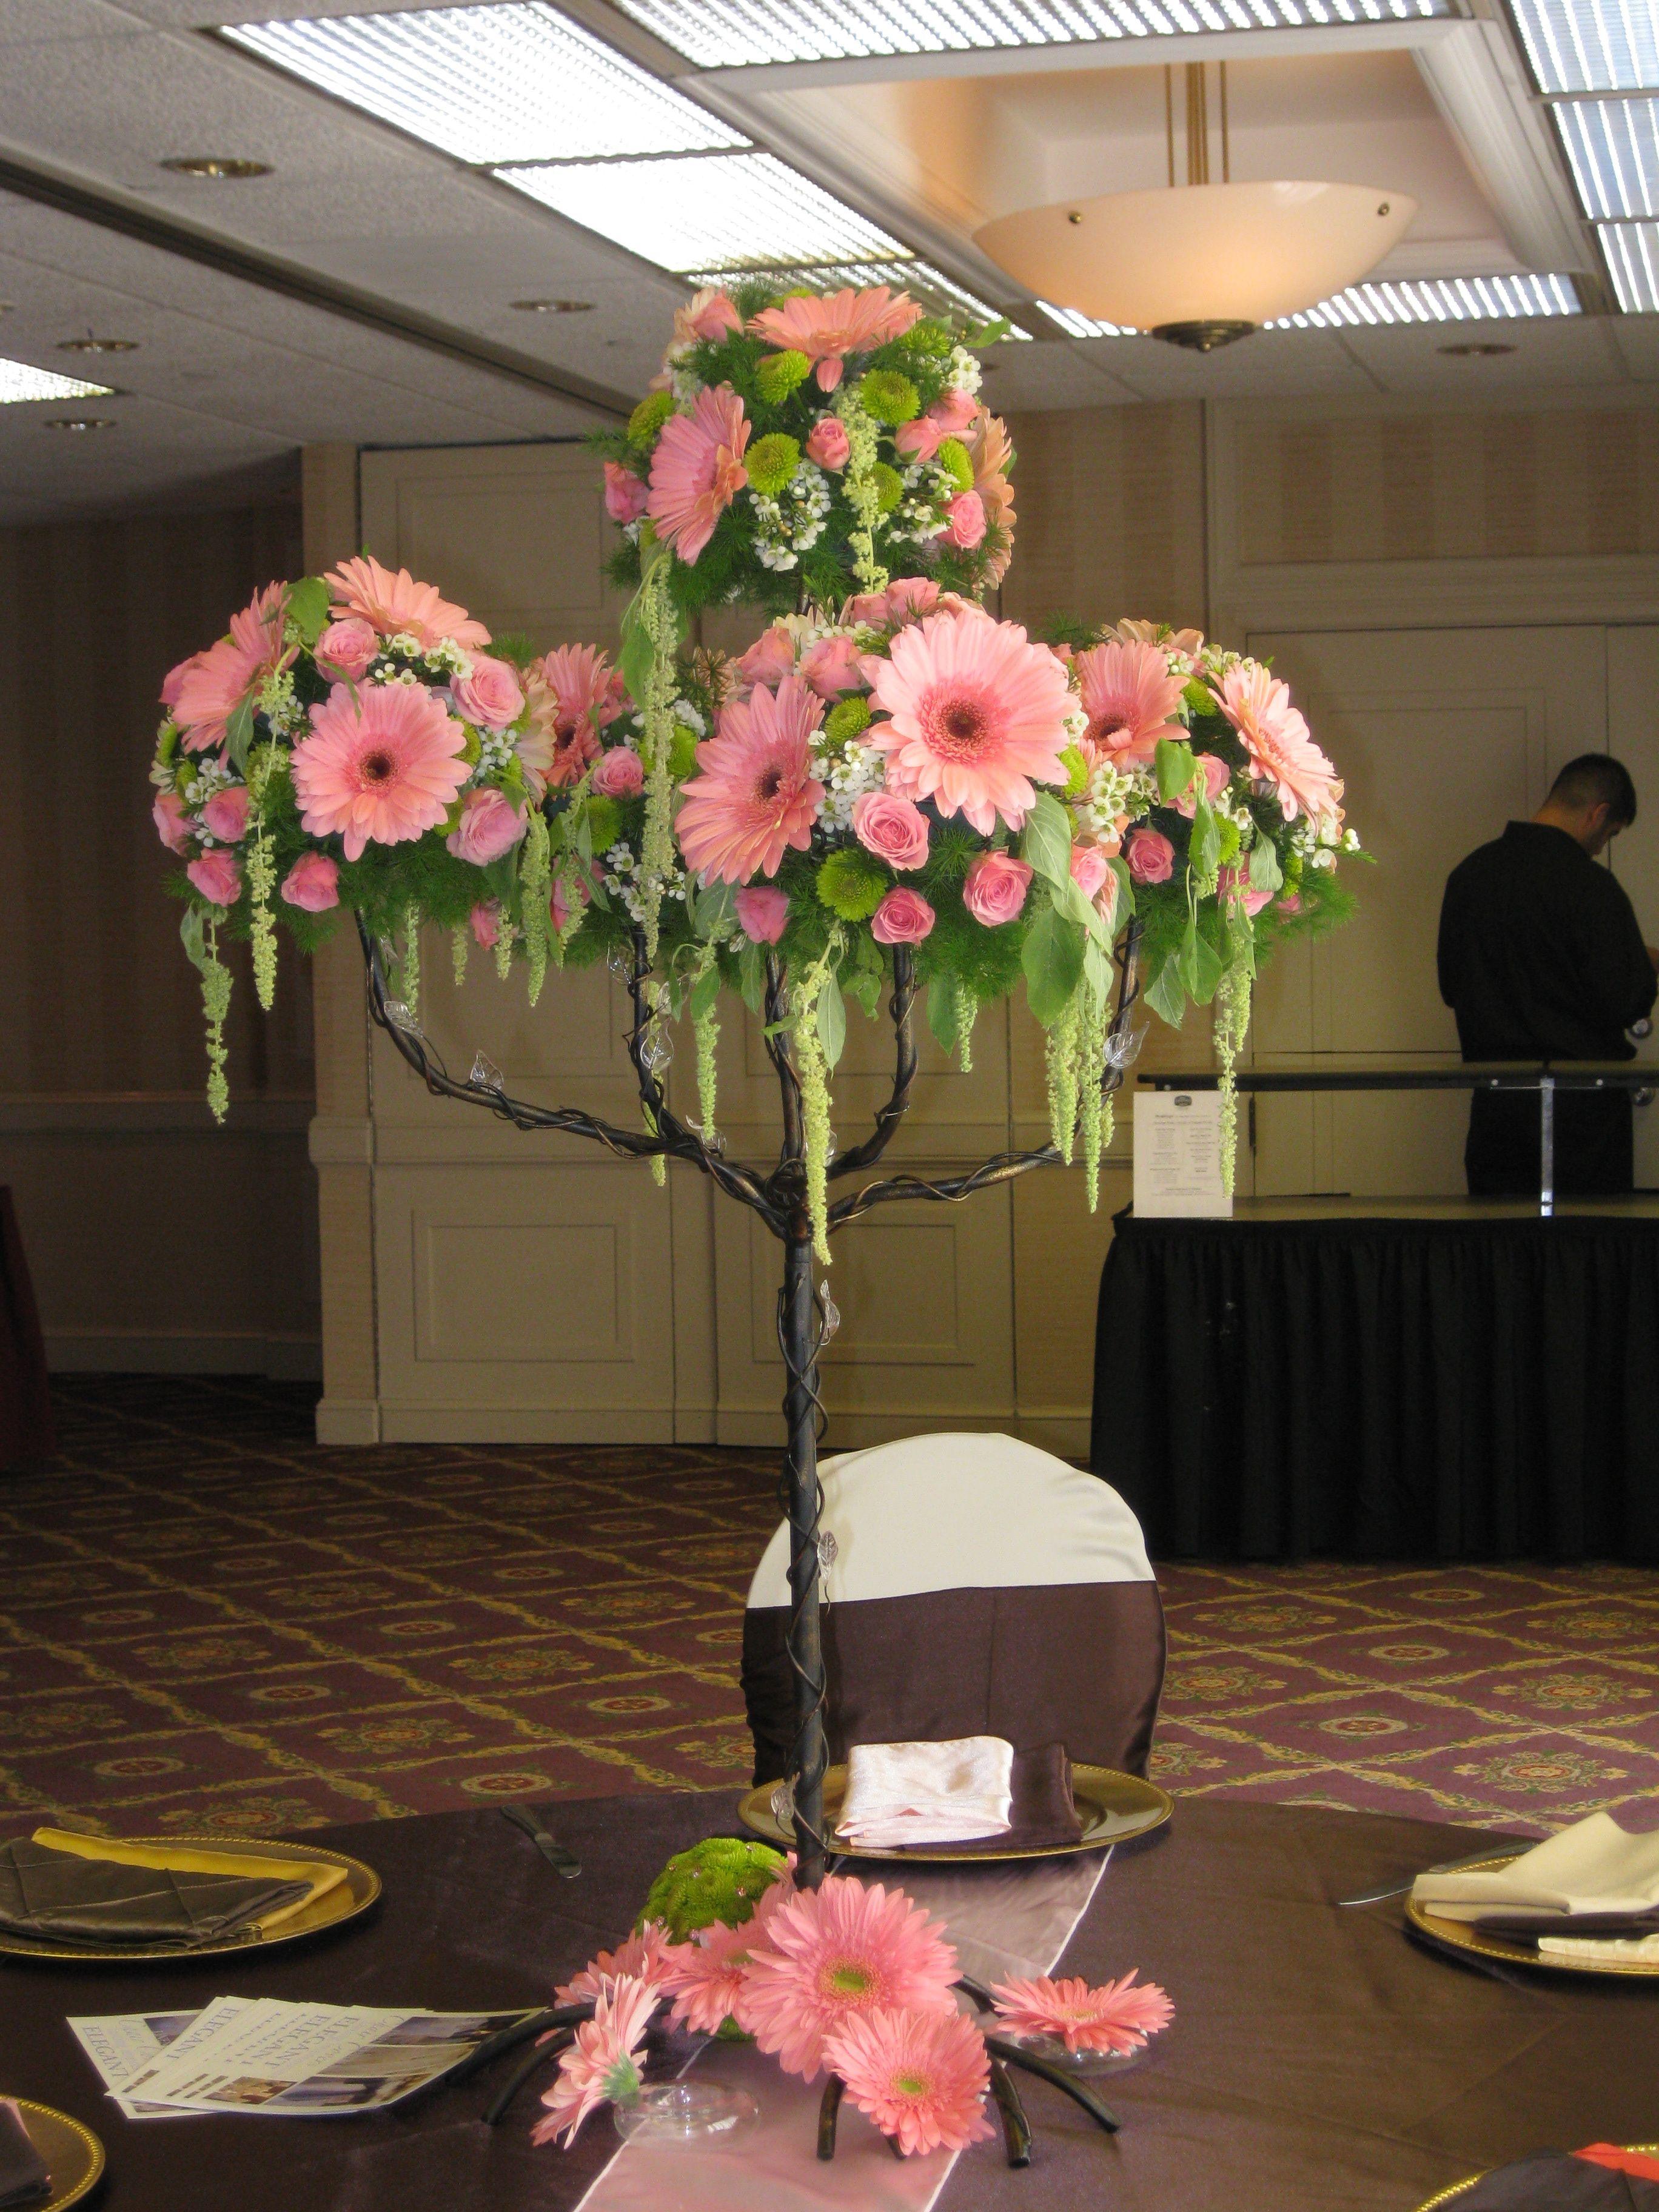 wedding centerpieces fake flowers%0A Tall wedding centerpiece more moss  less floral